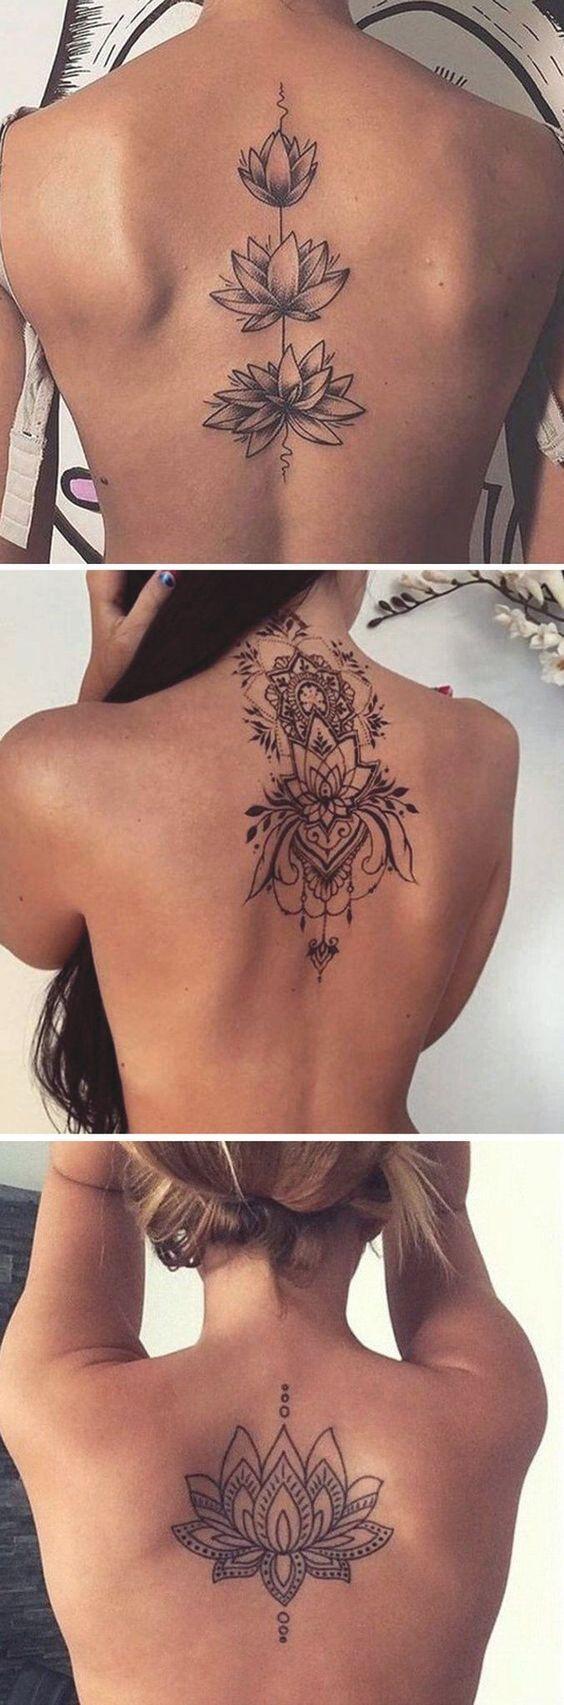 Photo of Realistic Lotus Mandala Tattoo Back Ideas – Unalome Spine Tat – Little Lotus… Tattoos #diybesttattoo – diy best tattoo ideas